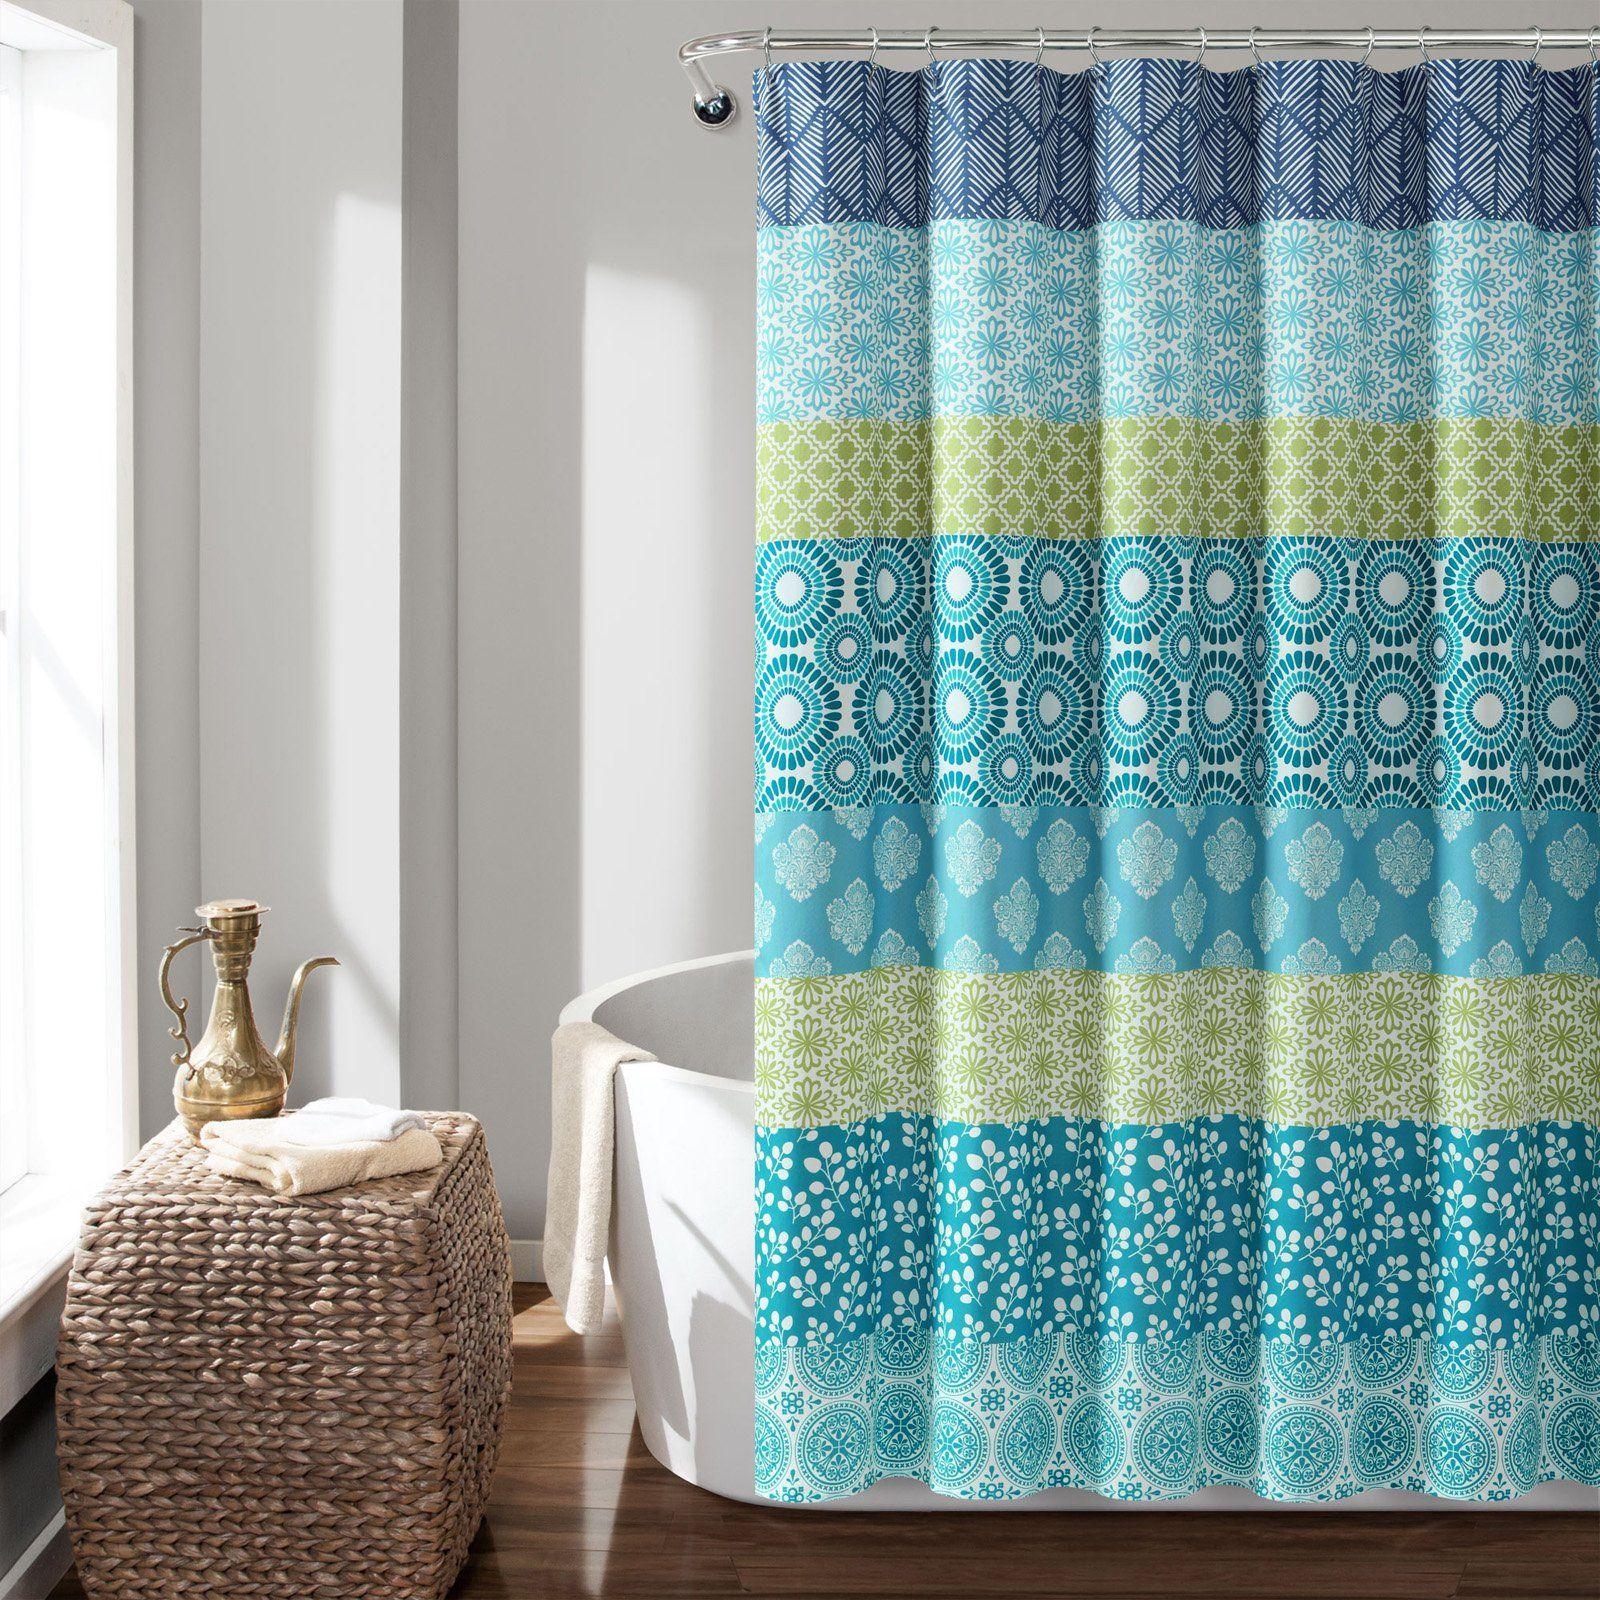 Lush Decor Bohemian Stripe Shower Curtain Blue Green Striped